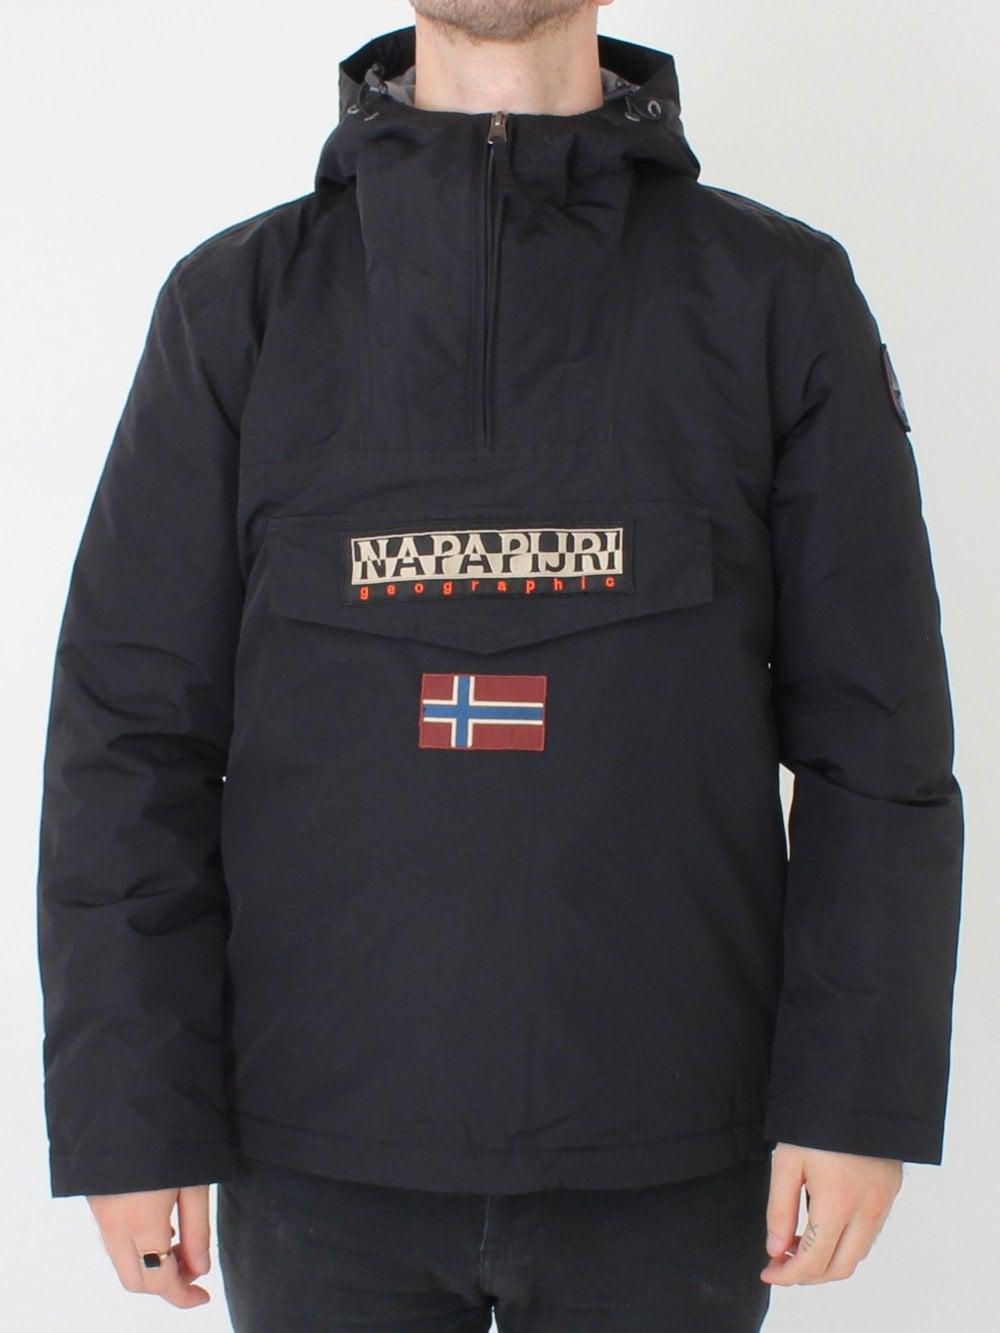 Napapijri Rainforest Winter Jacket in Black  d91dfffa169